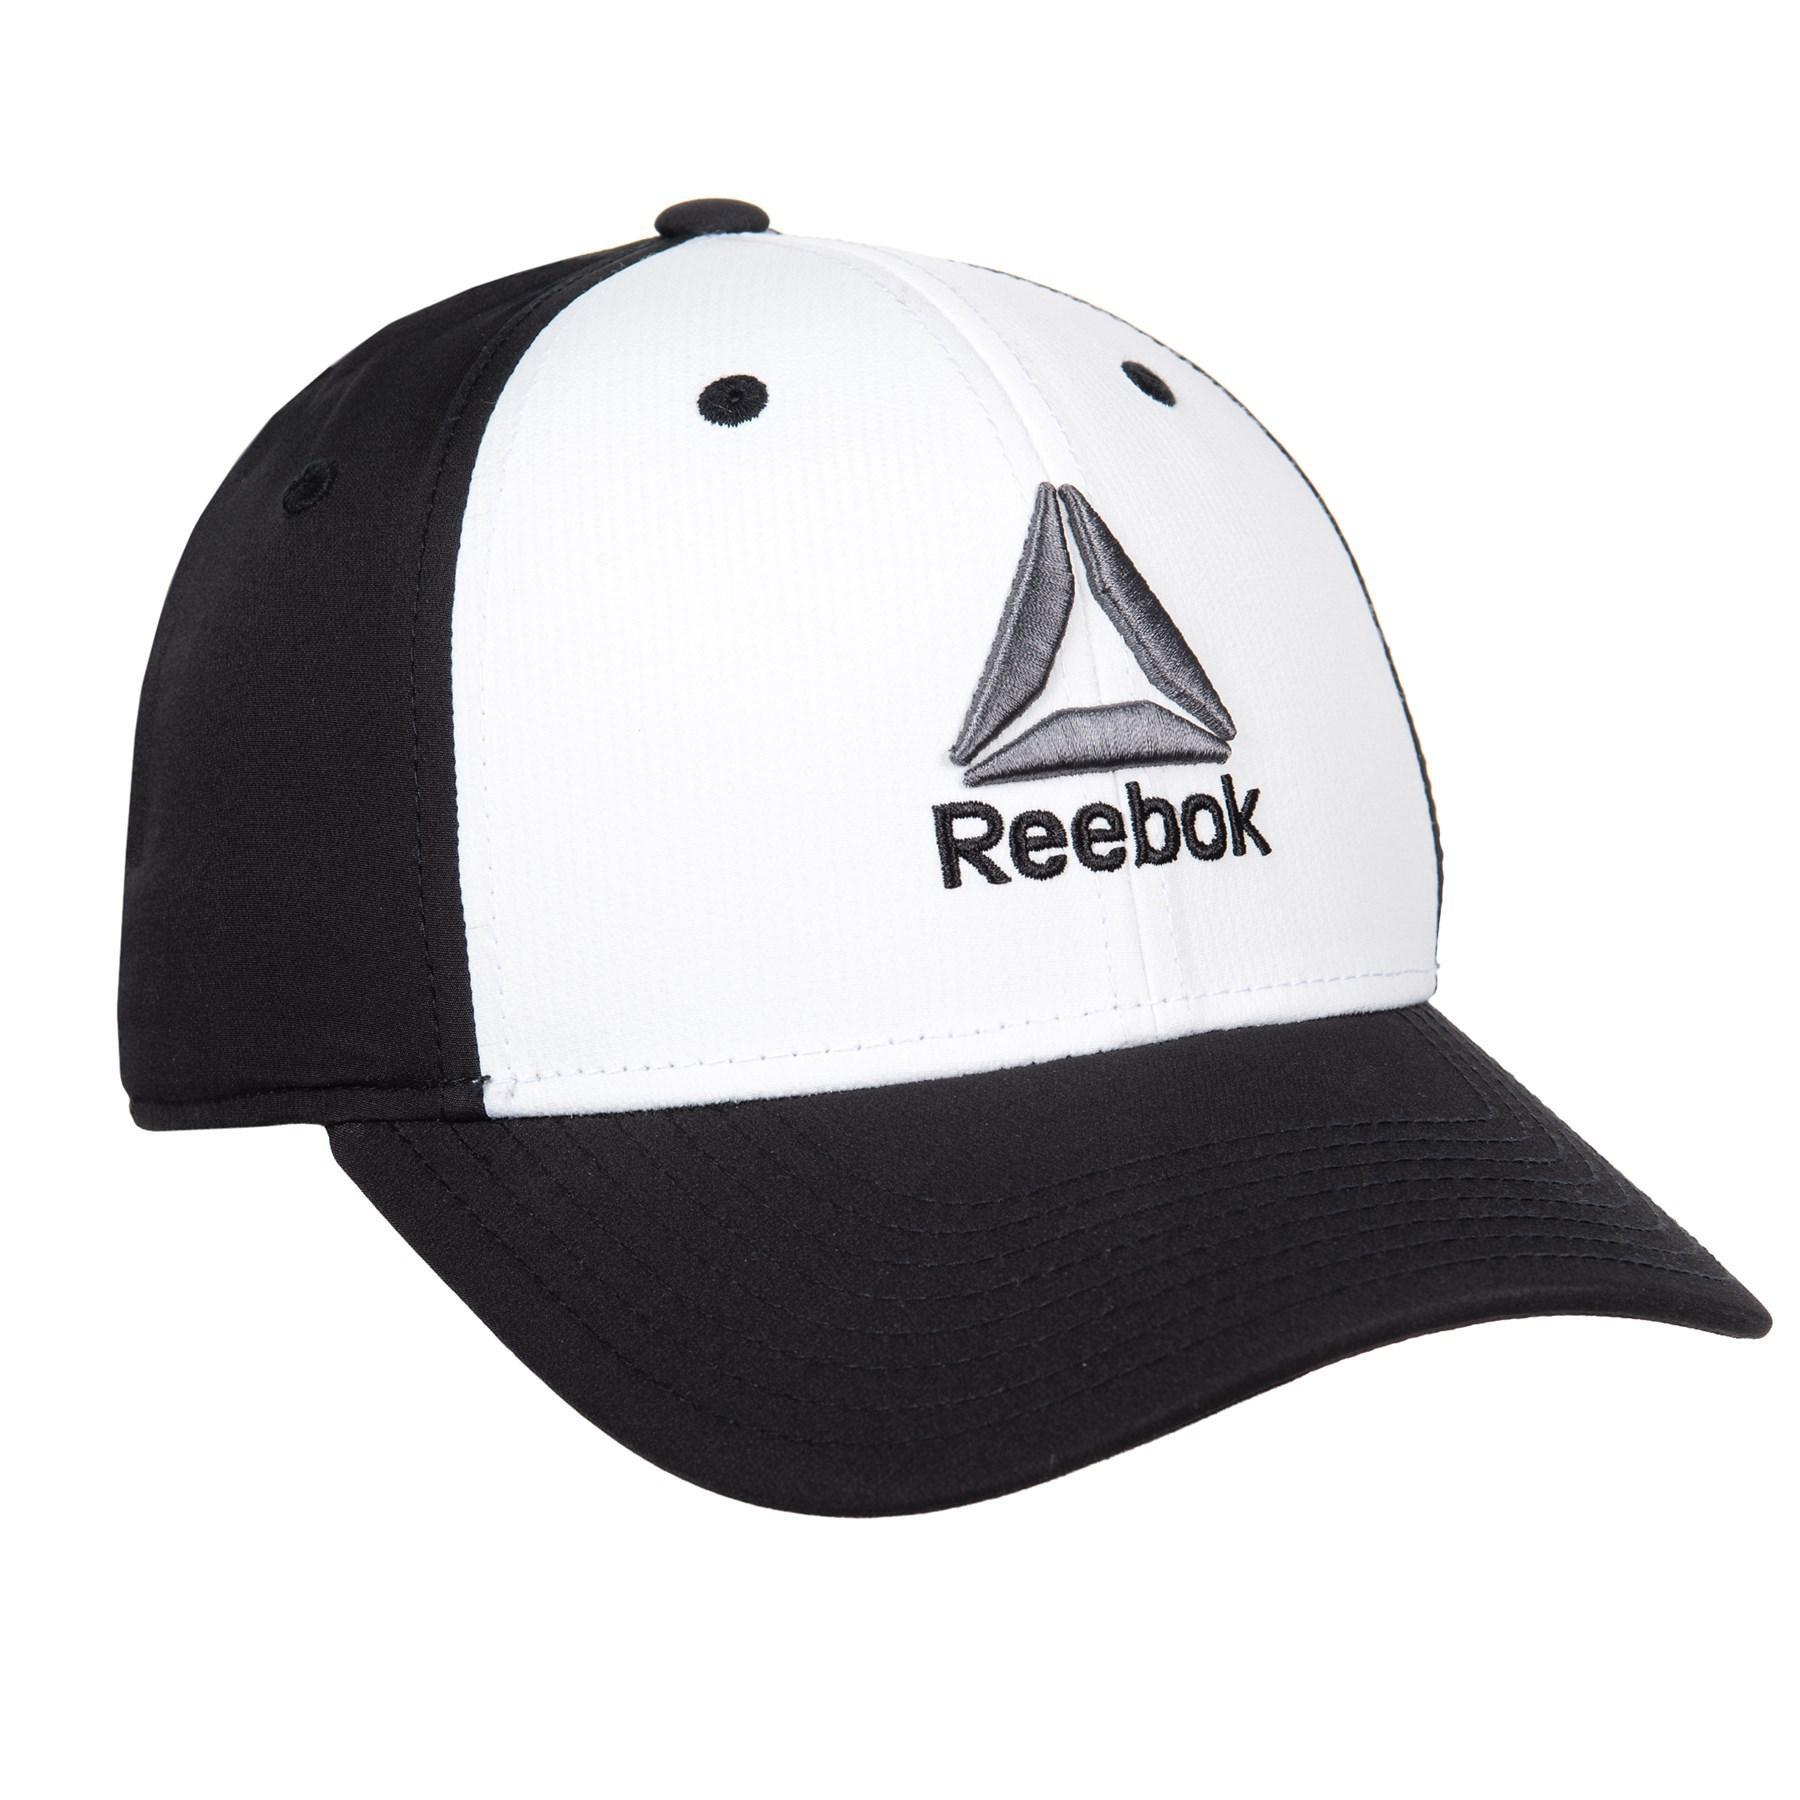 79fc1e990ab Reebok - Black Structured Stretch Colorblock Cap (for Men) for Men - Lyst.  View fullscreen